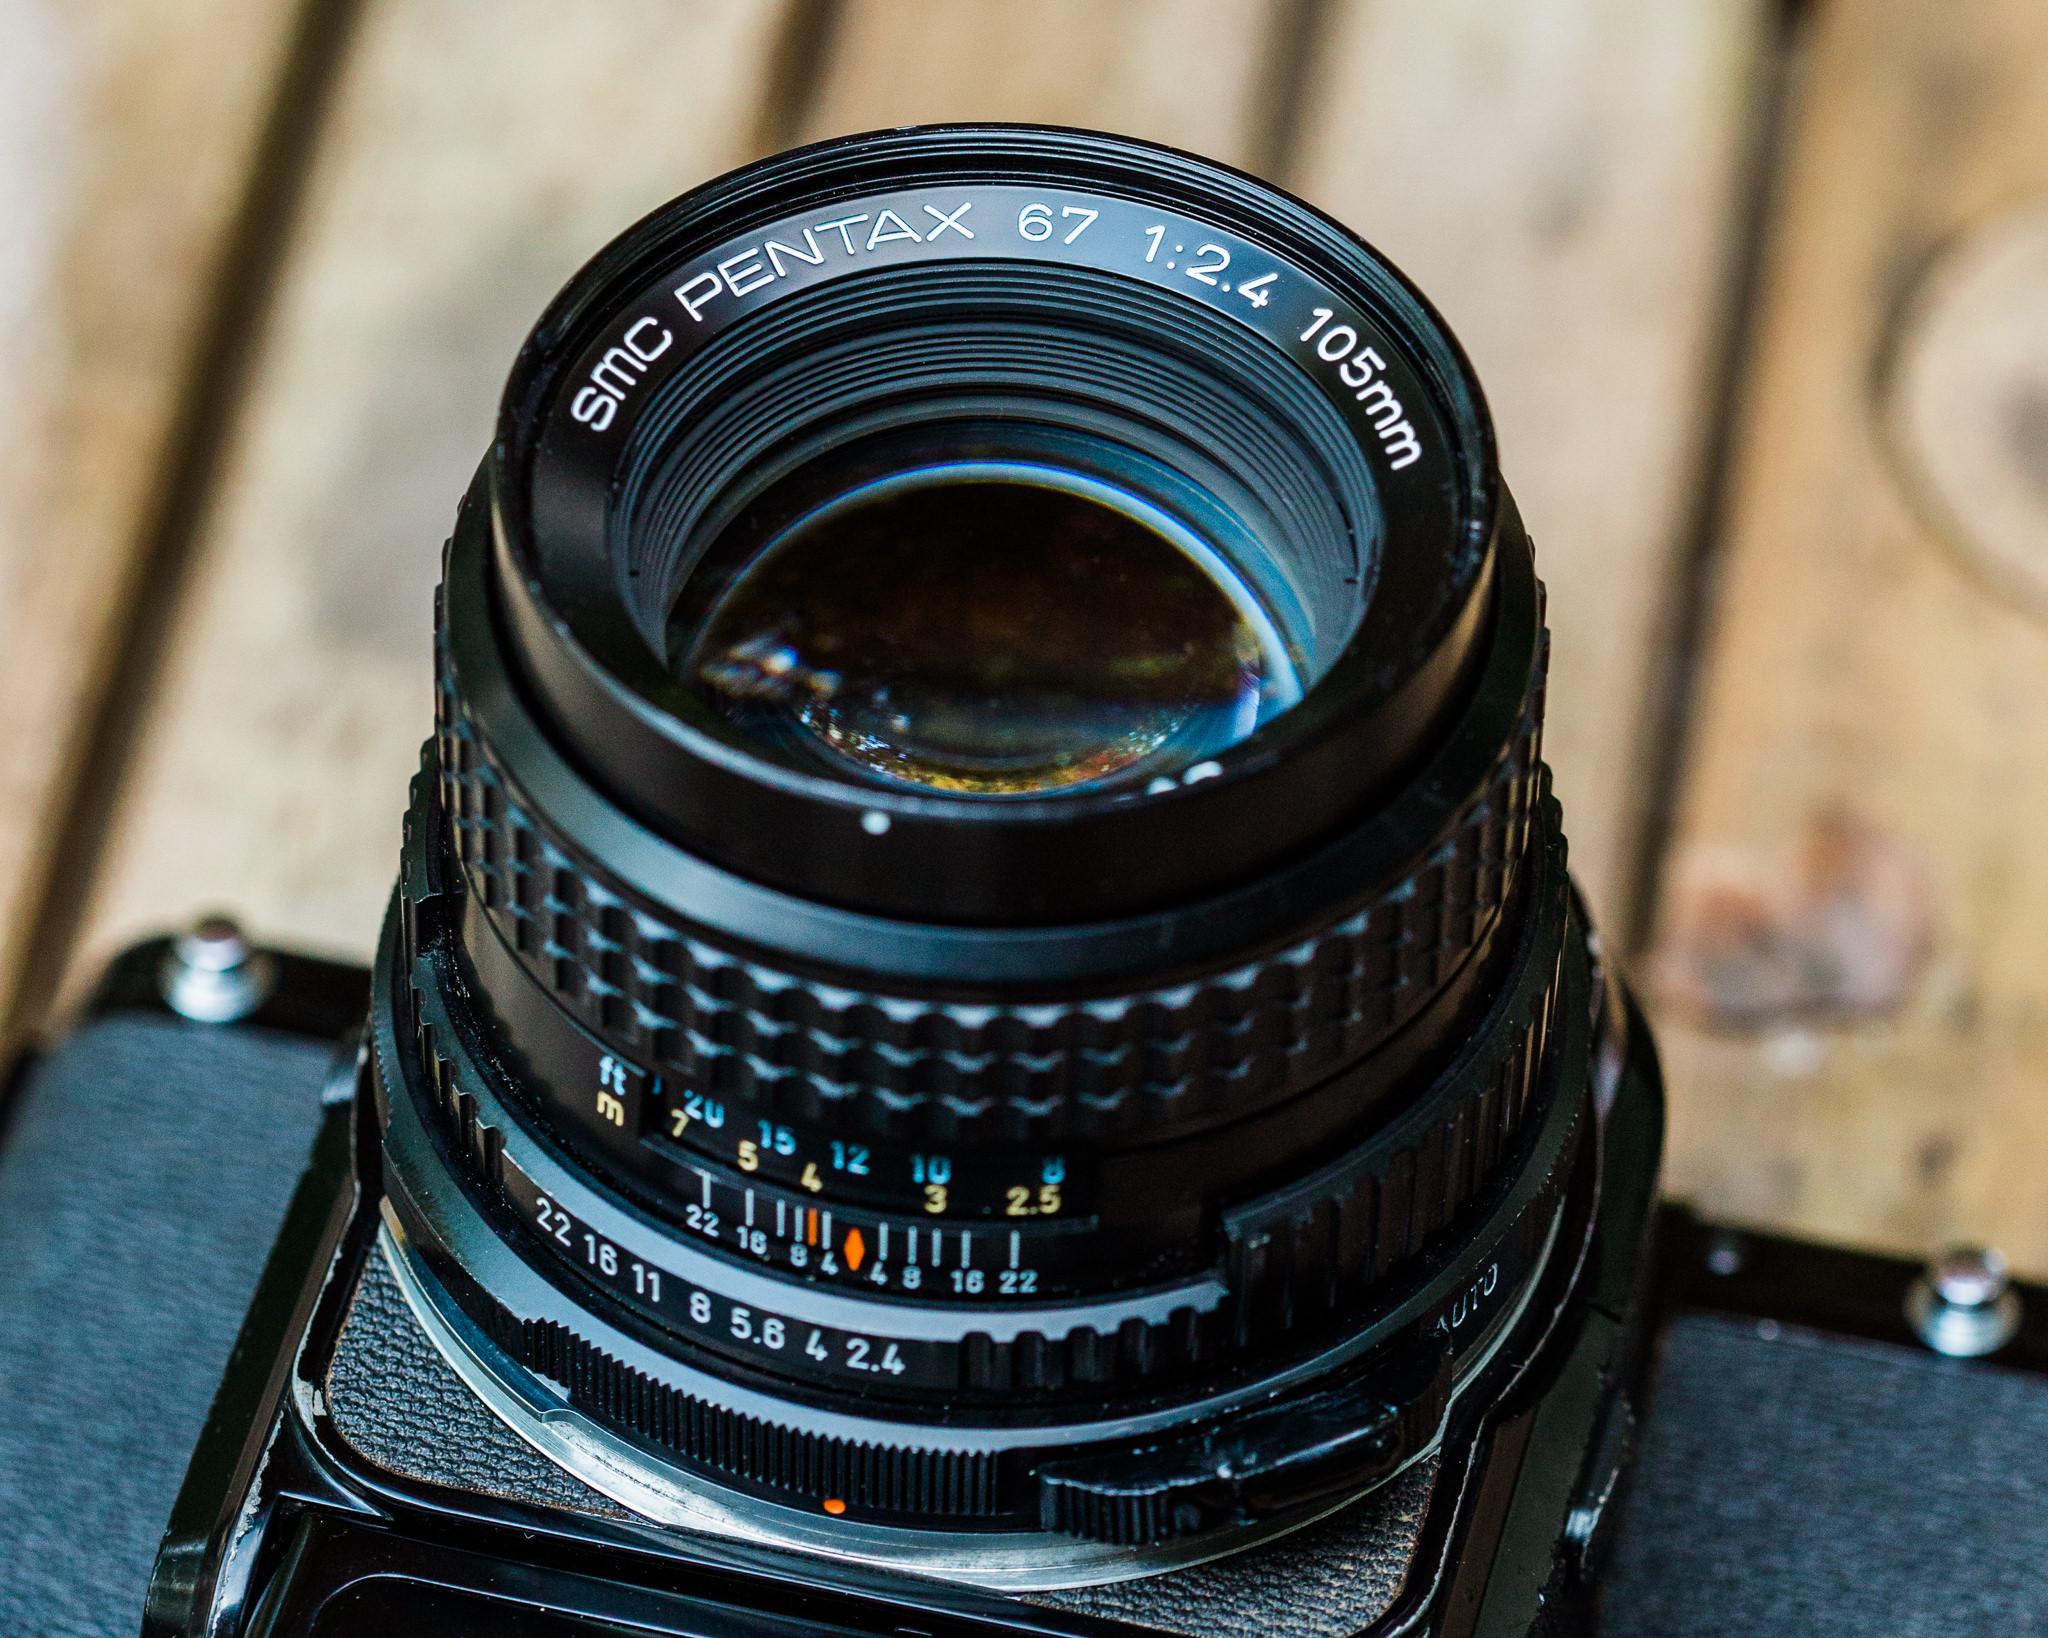 SMC Pentax 67 105mm f/2.4 Lens